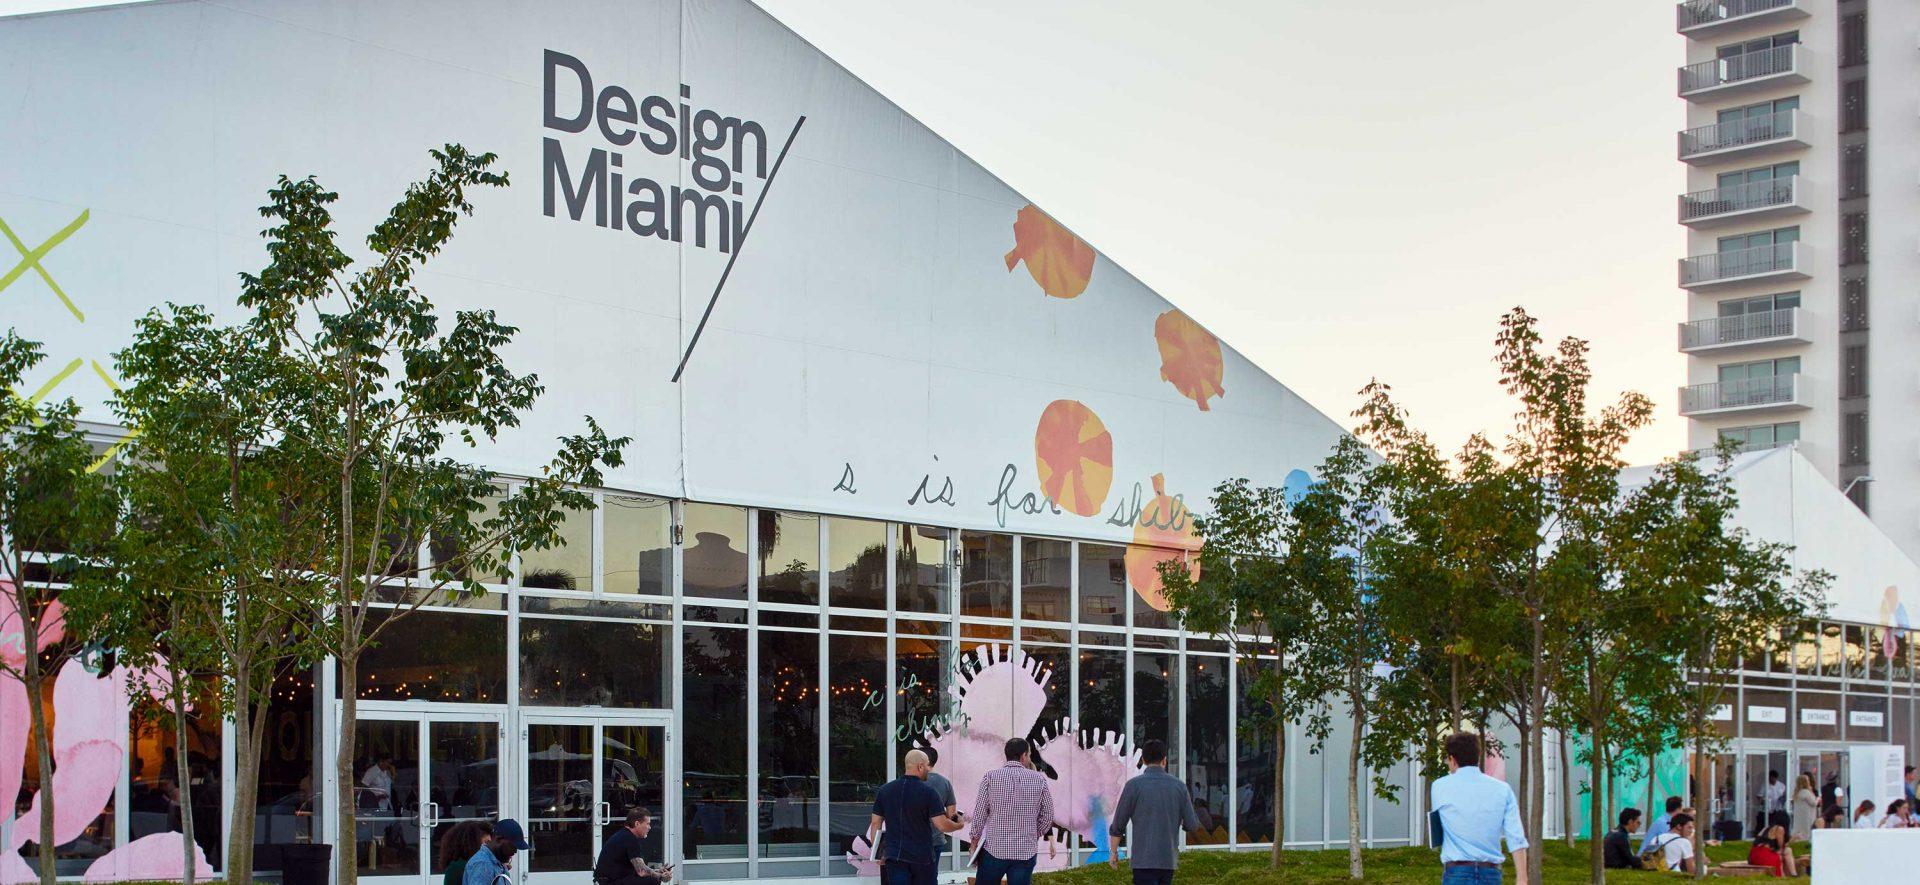 Design Miami exterior in Miami, Florida